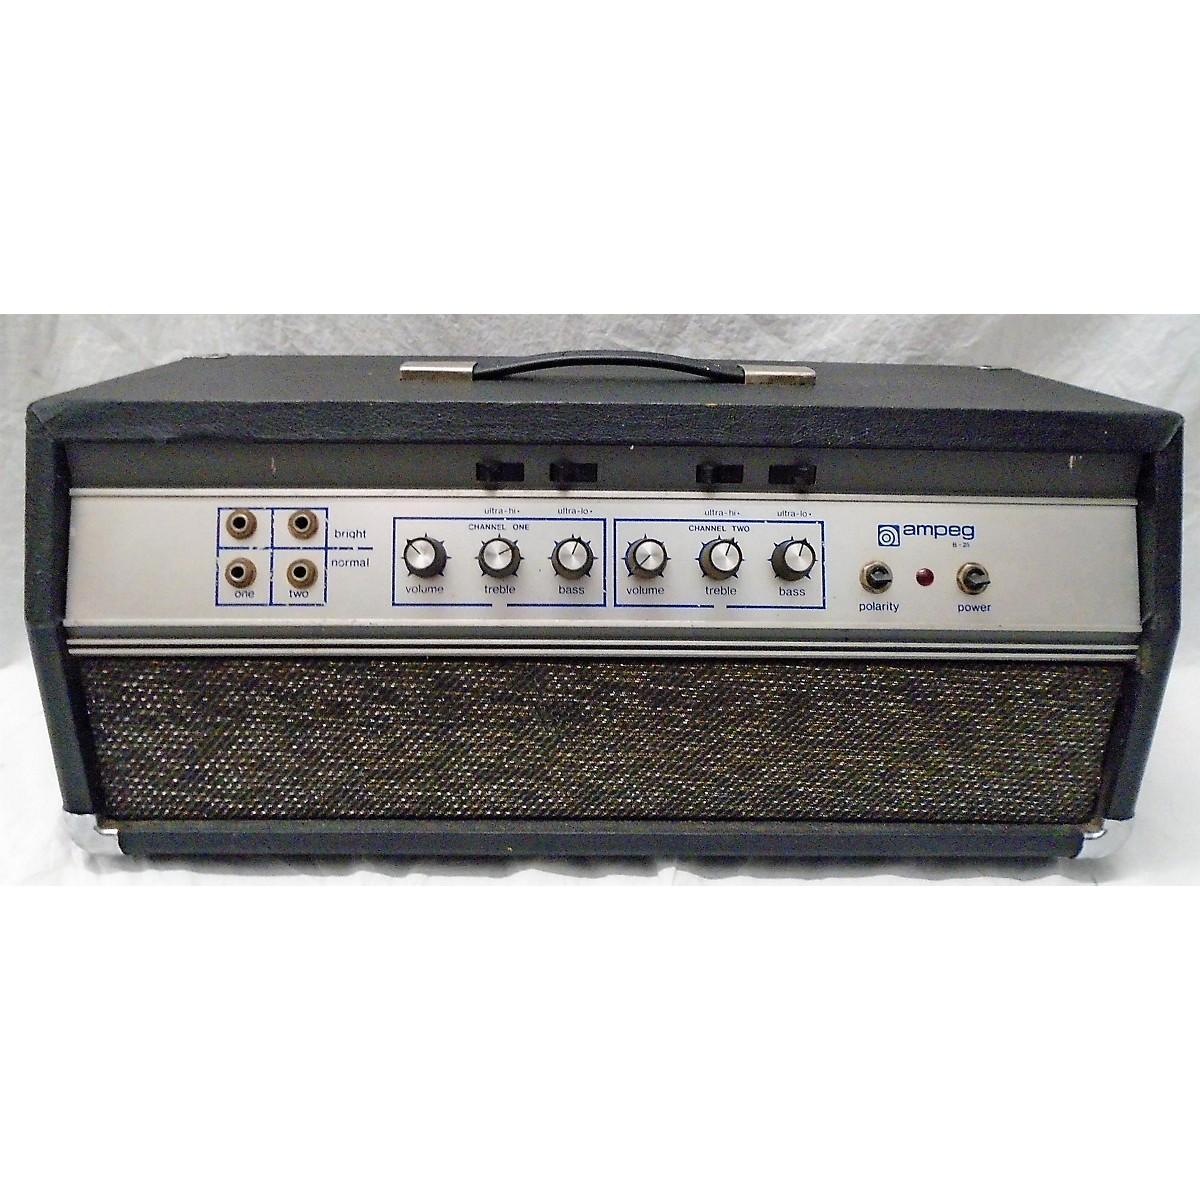 Ampeg 1970 B25 Head Tube Guitar Amp Head